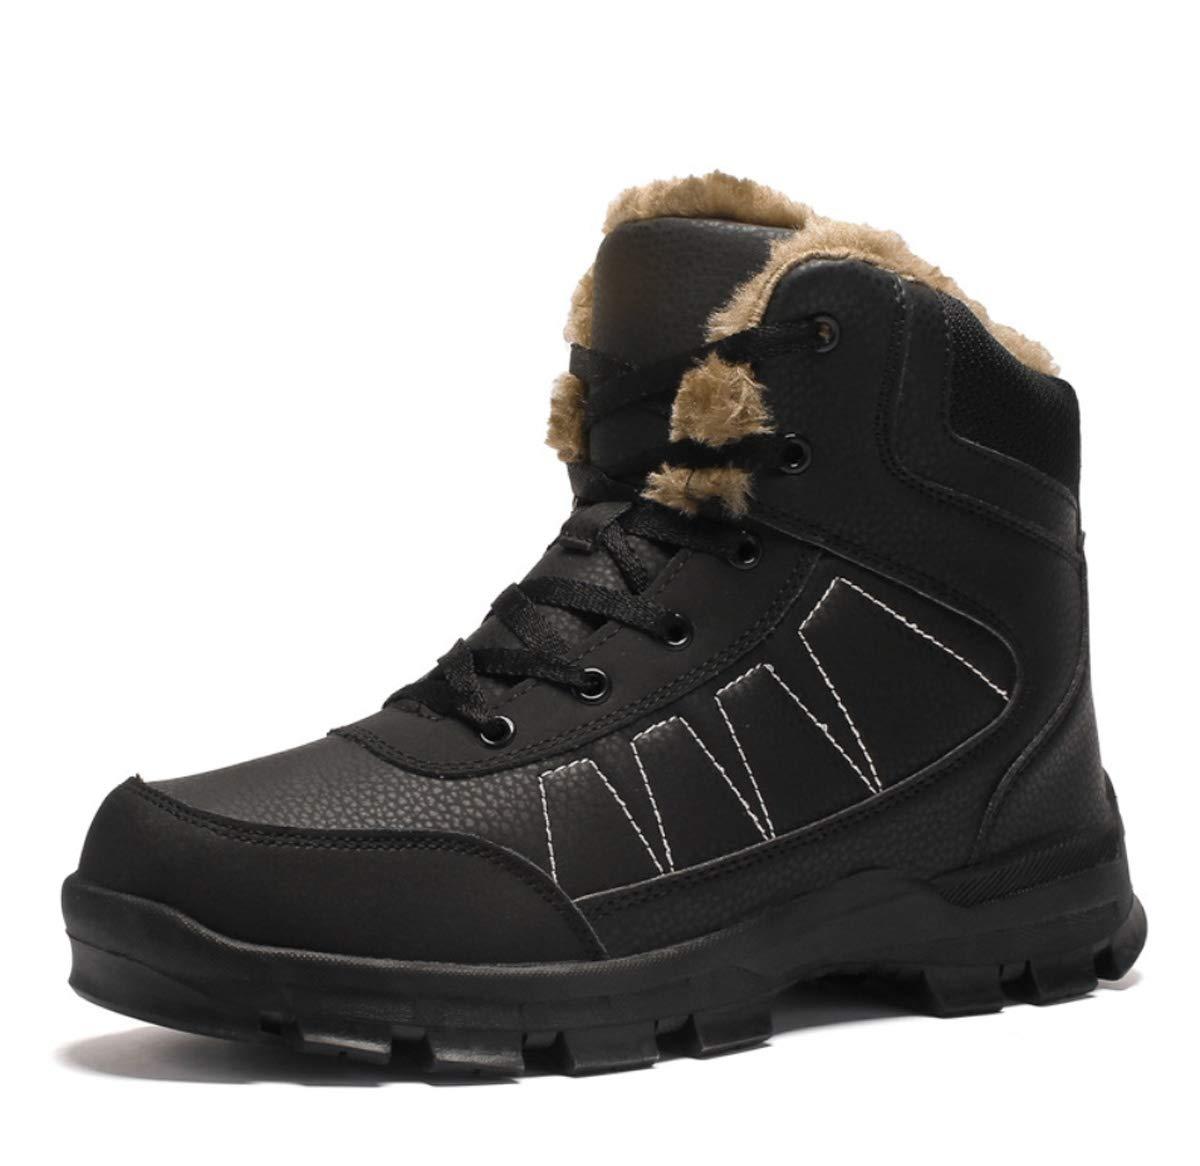 DANDANJIE Herren Schuhe mit High-Top-Winter Outdoor Wanderschuhe Anti-Rutsch-Turnschuhe Warm Snow Stiefel